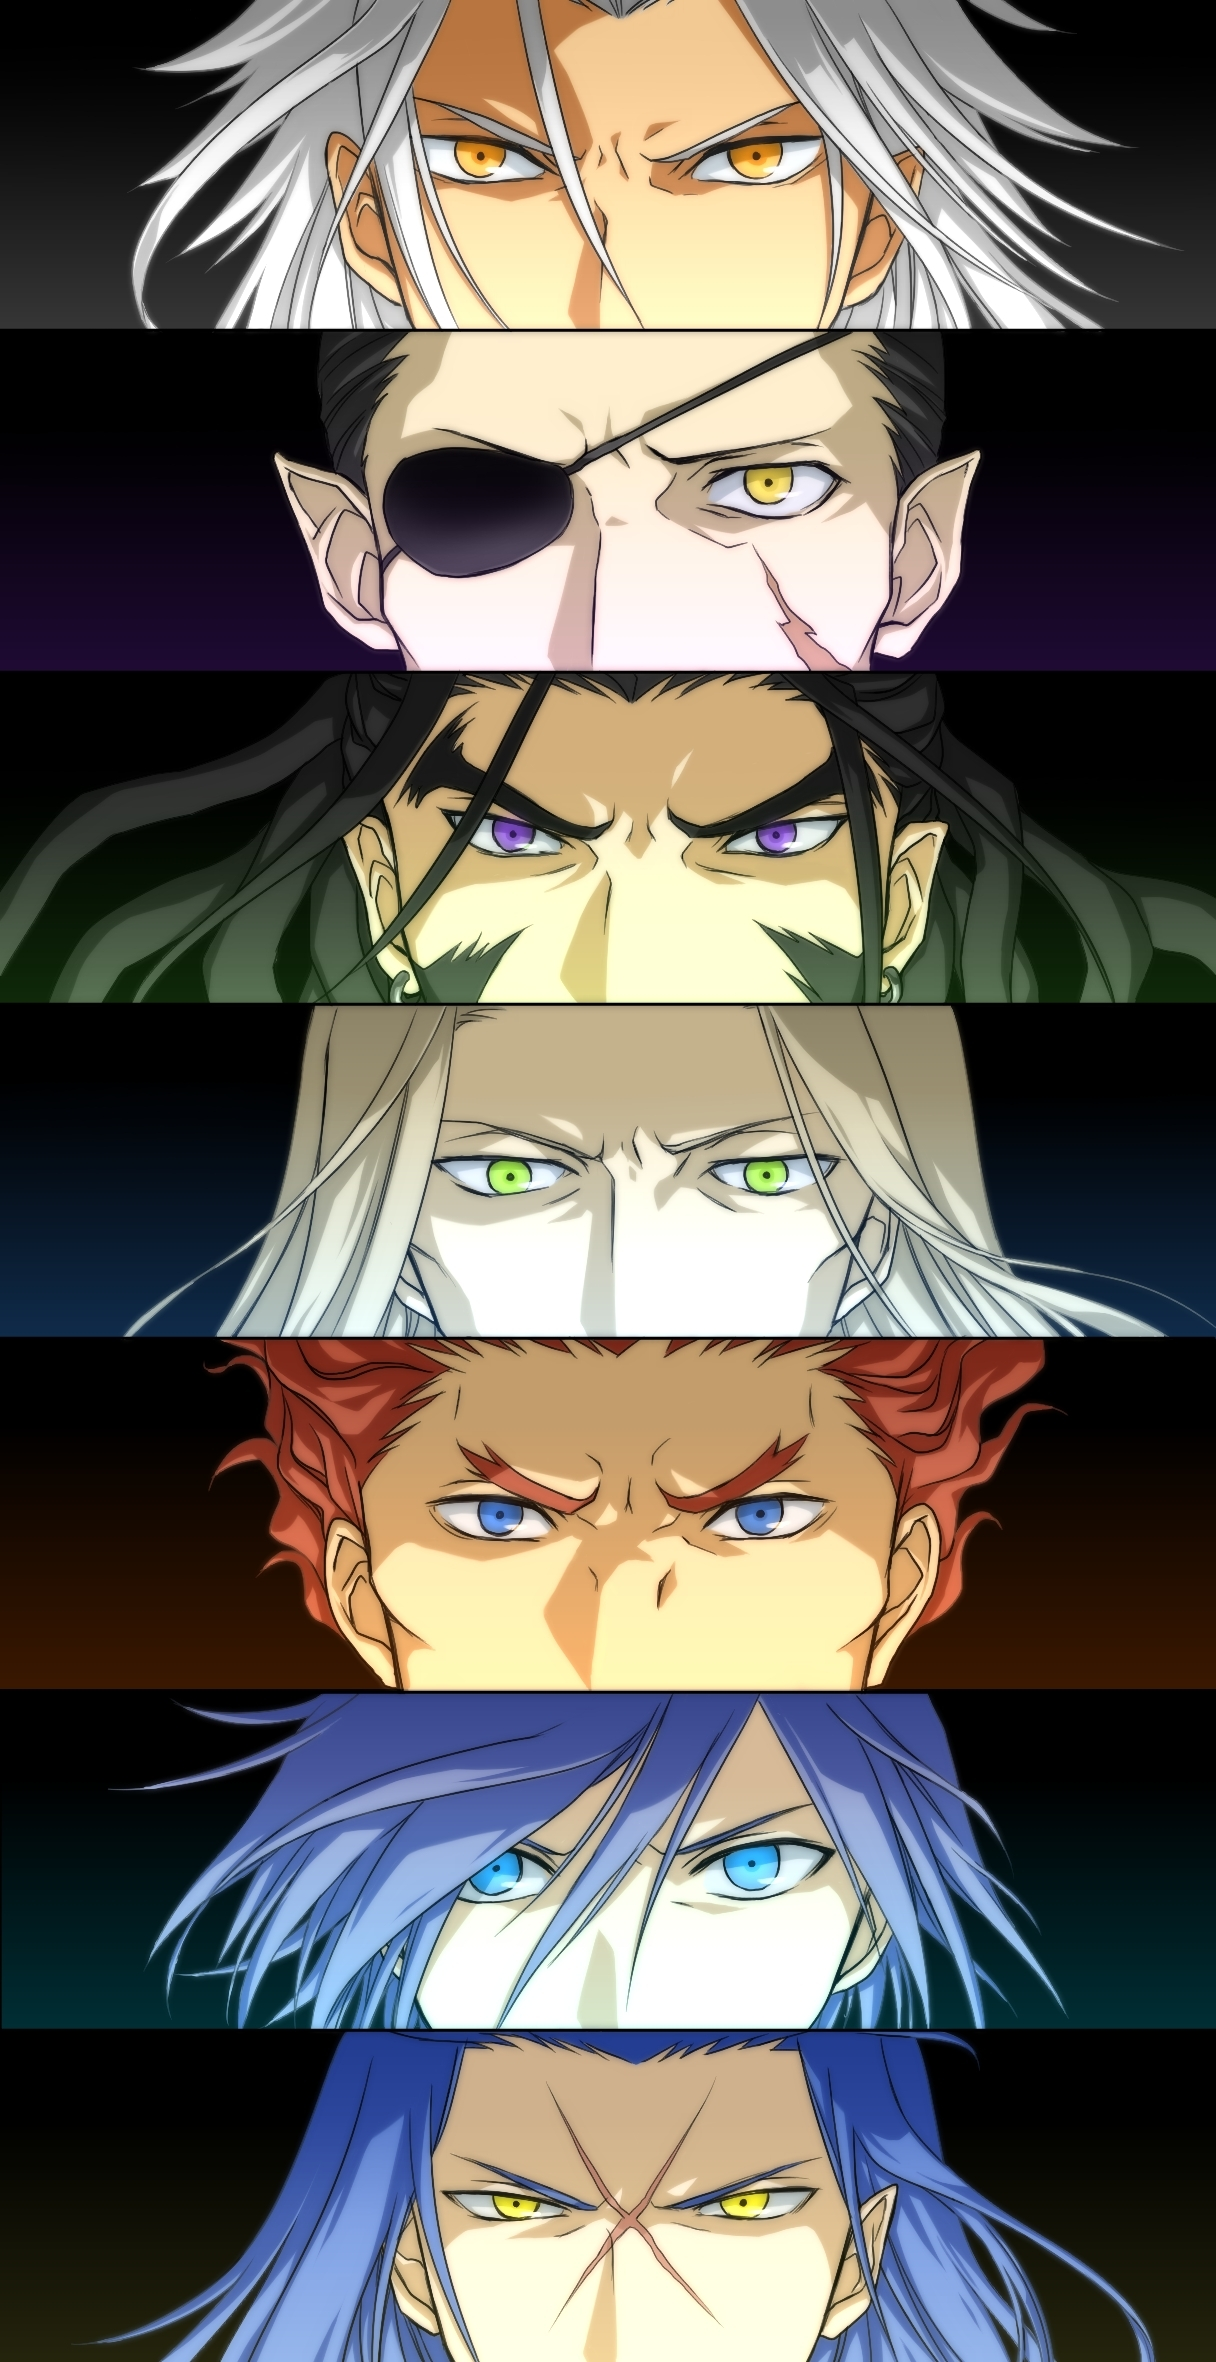 Kh organization 13 hentai